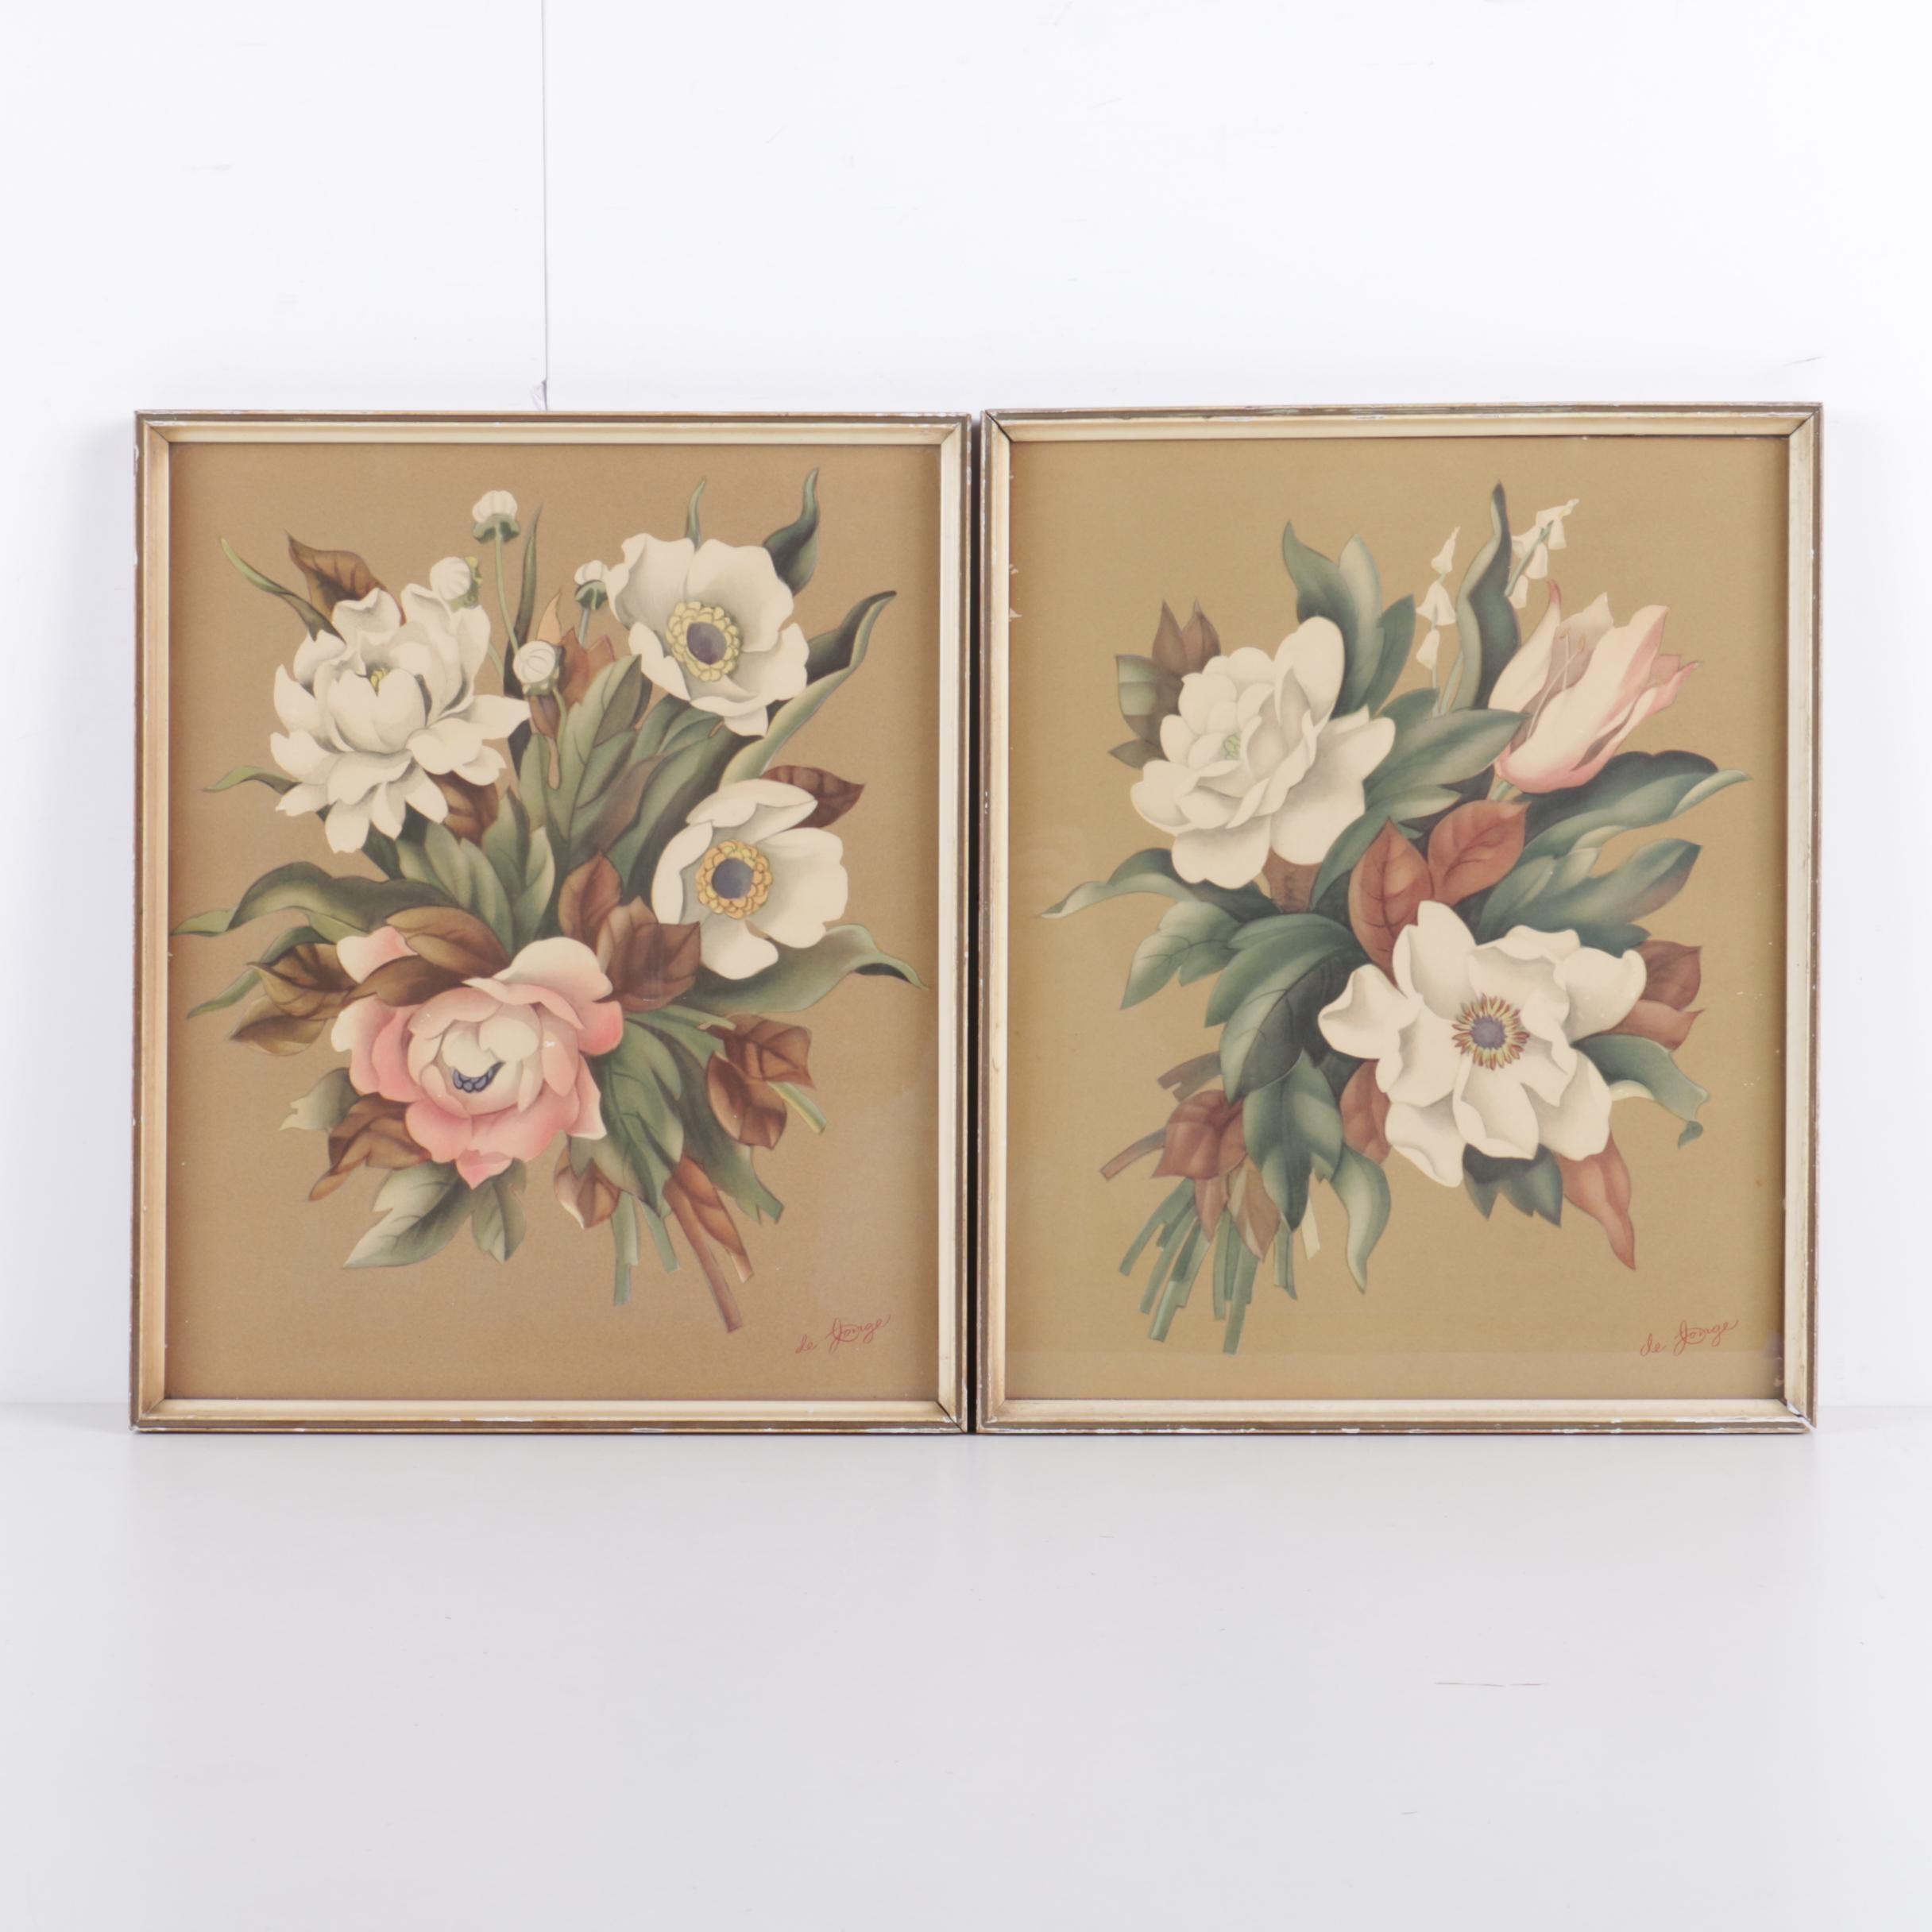 Sandford de Jonge Offset Lithograph Prints of Flowers